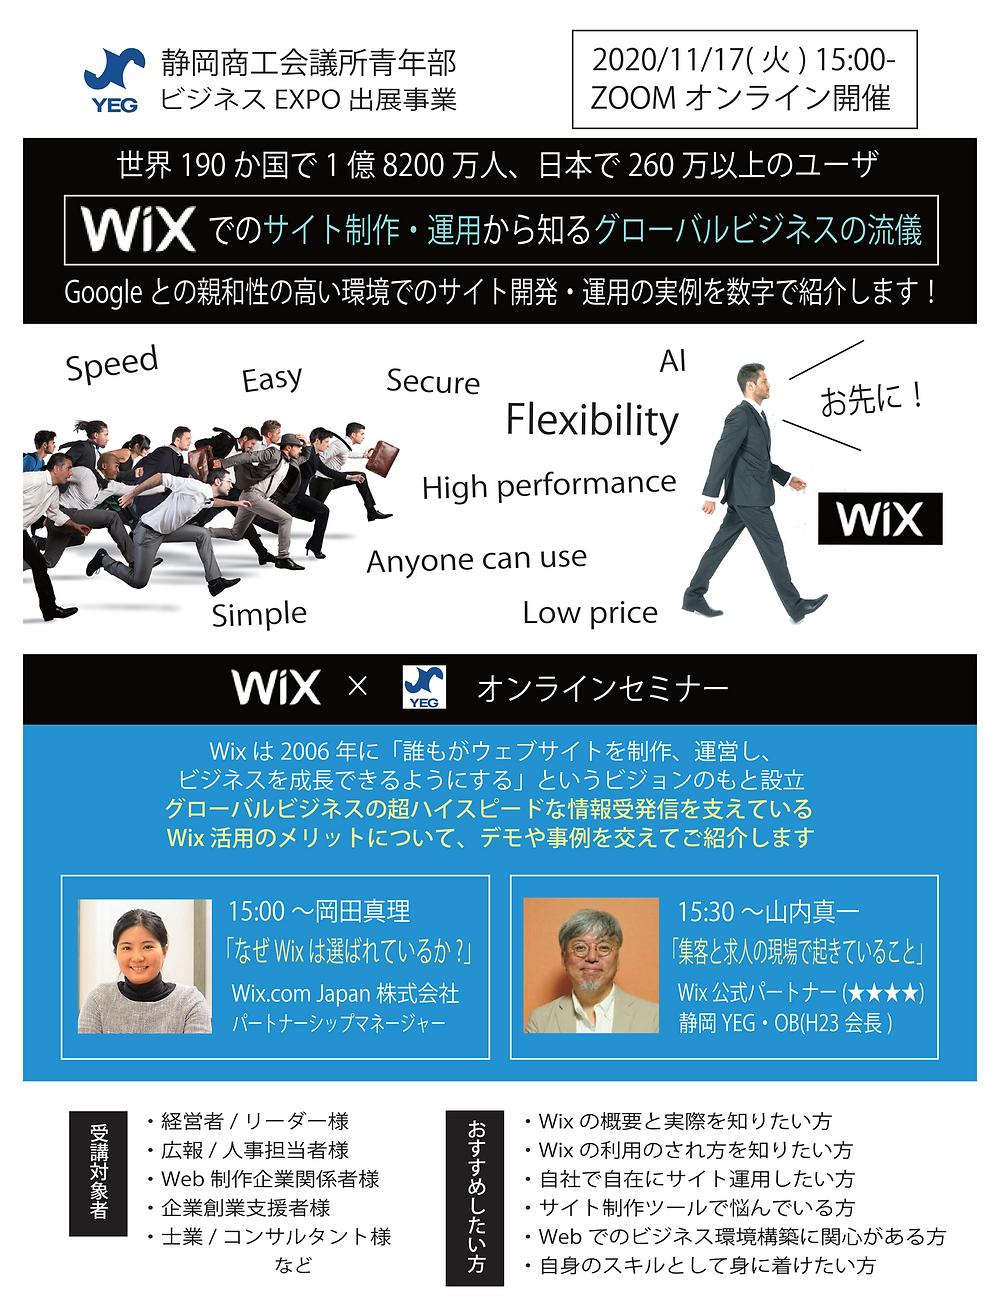 Wix.com Japan様とWix公式パートナー★★★★テットコム山内真一とのコラボによるオンラインセミナー